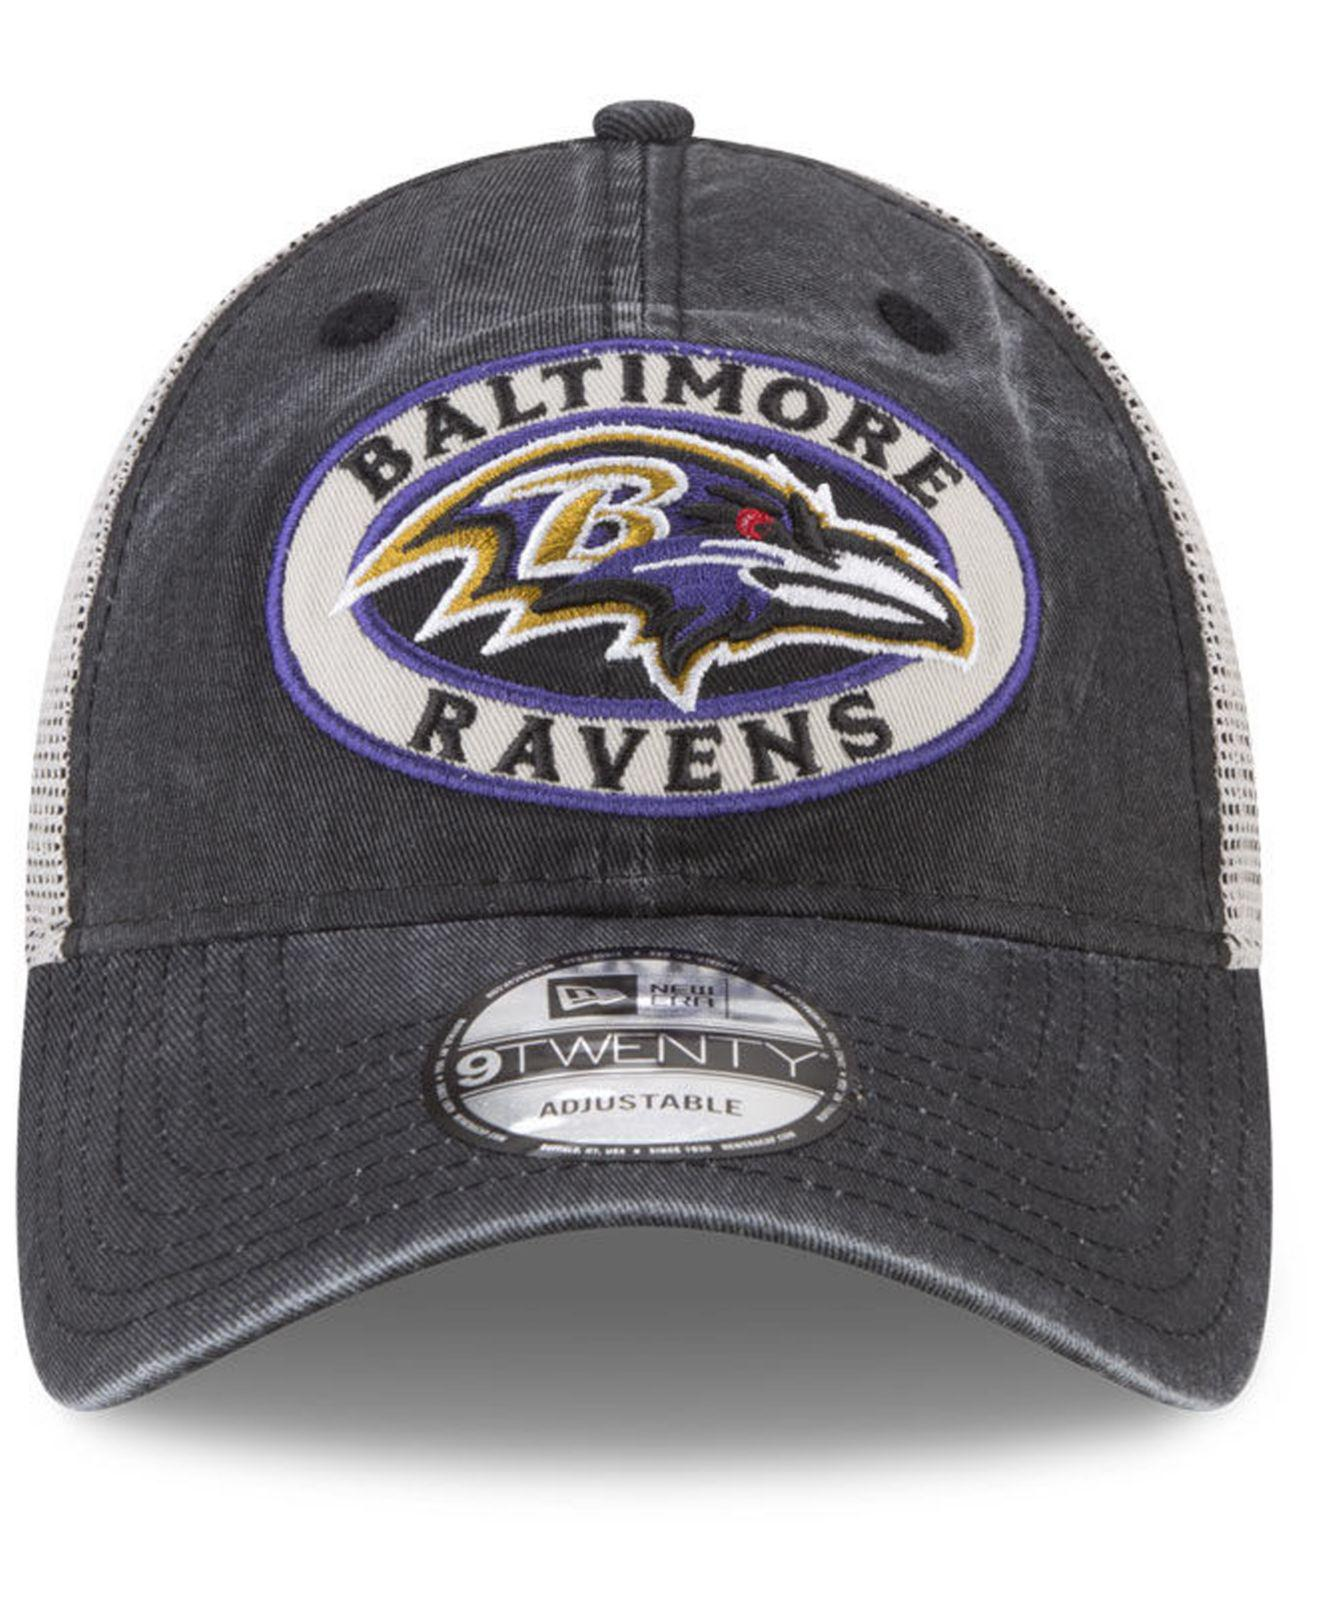 Lyst - Ktz Baltimore Ravens Patched Pride 9twenty Cap in Black for Men 85e22ac724a8